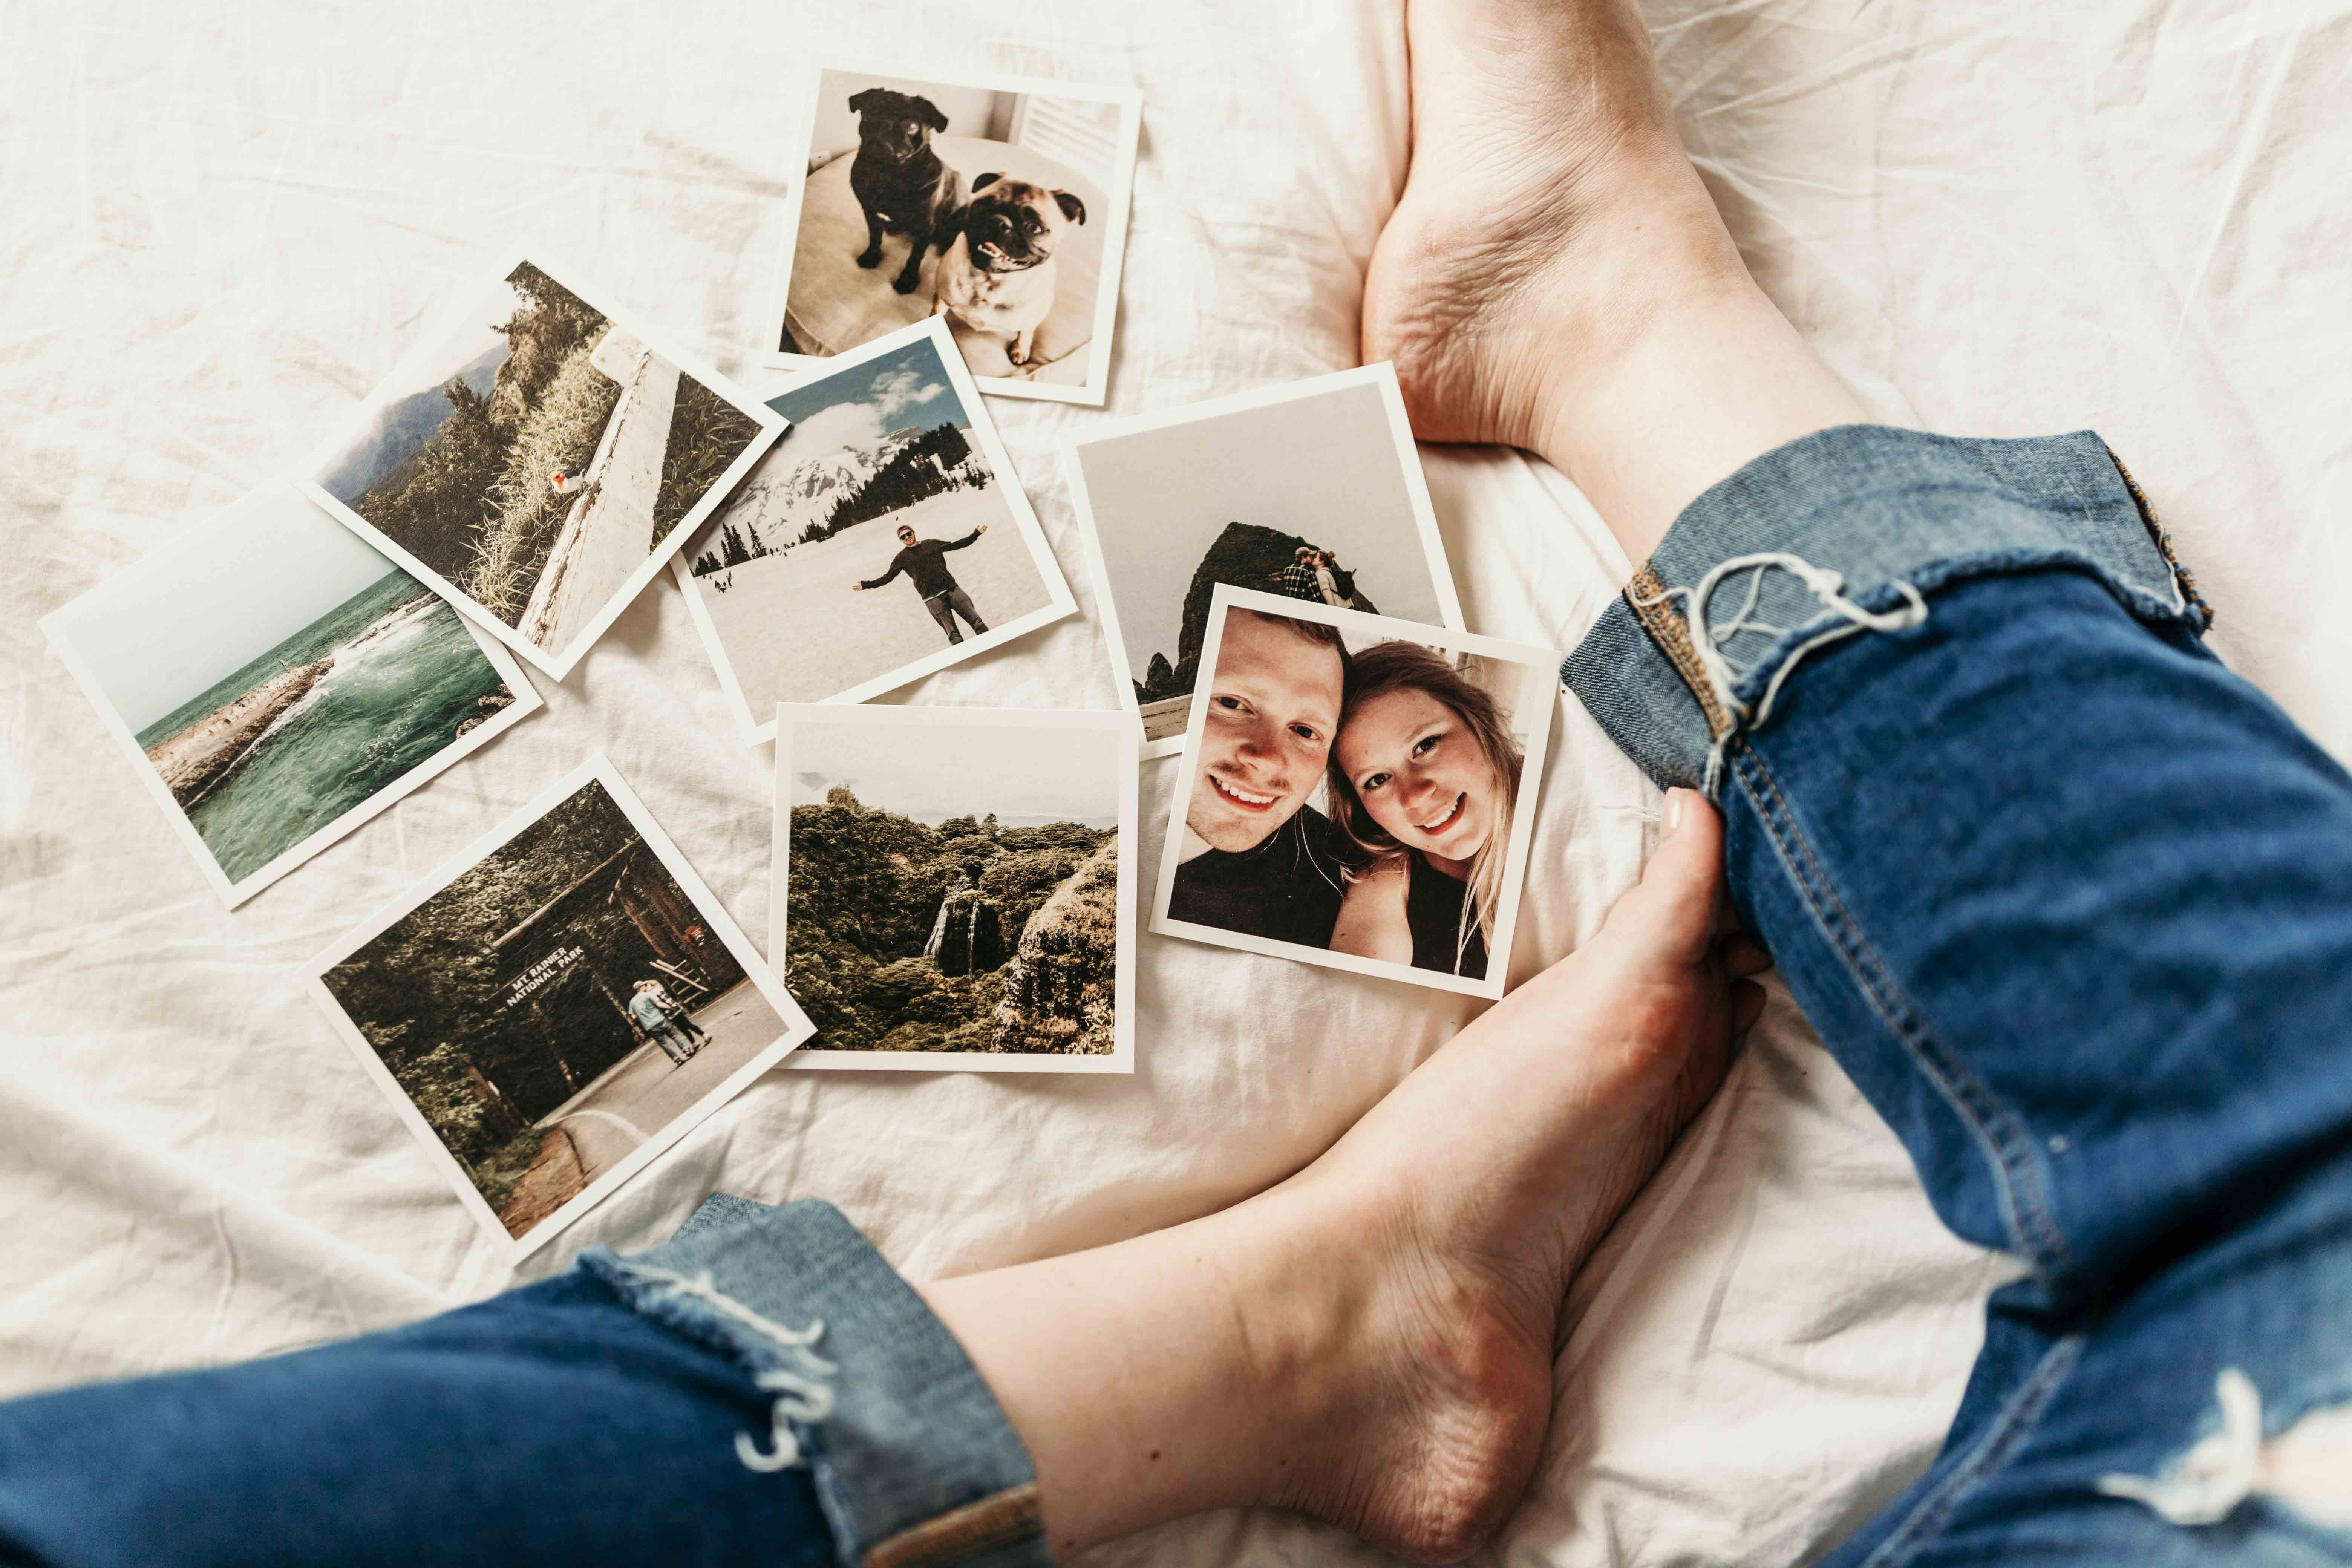 Fotos instantáneas / ielectro